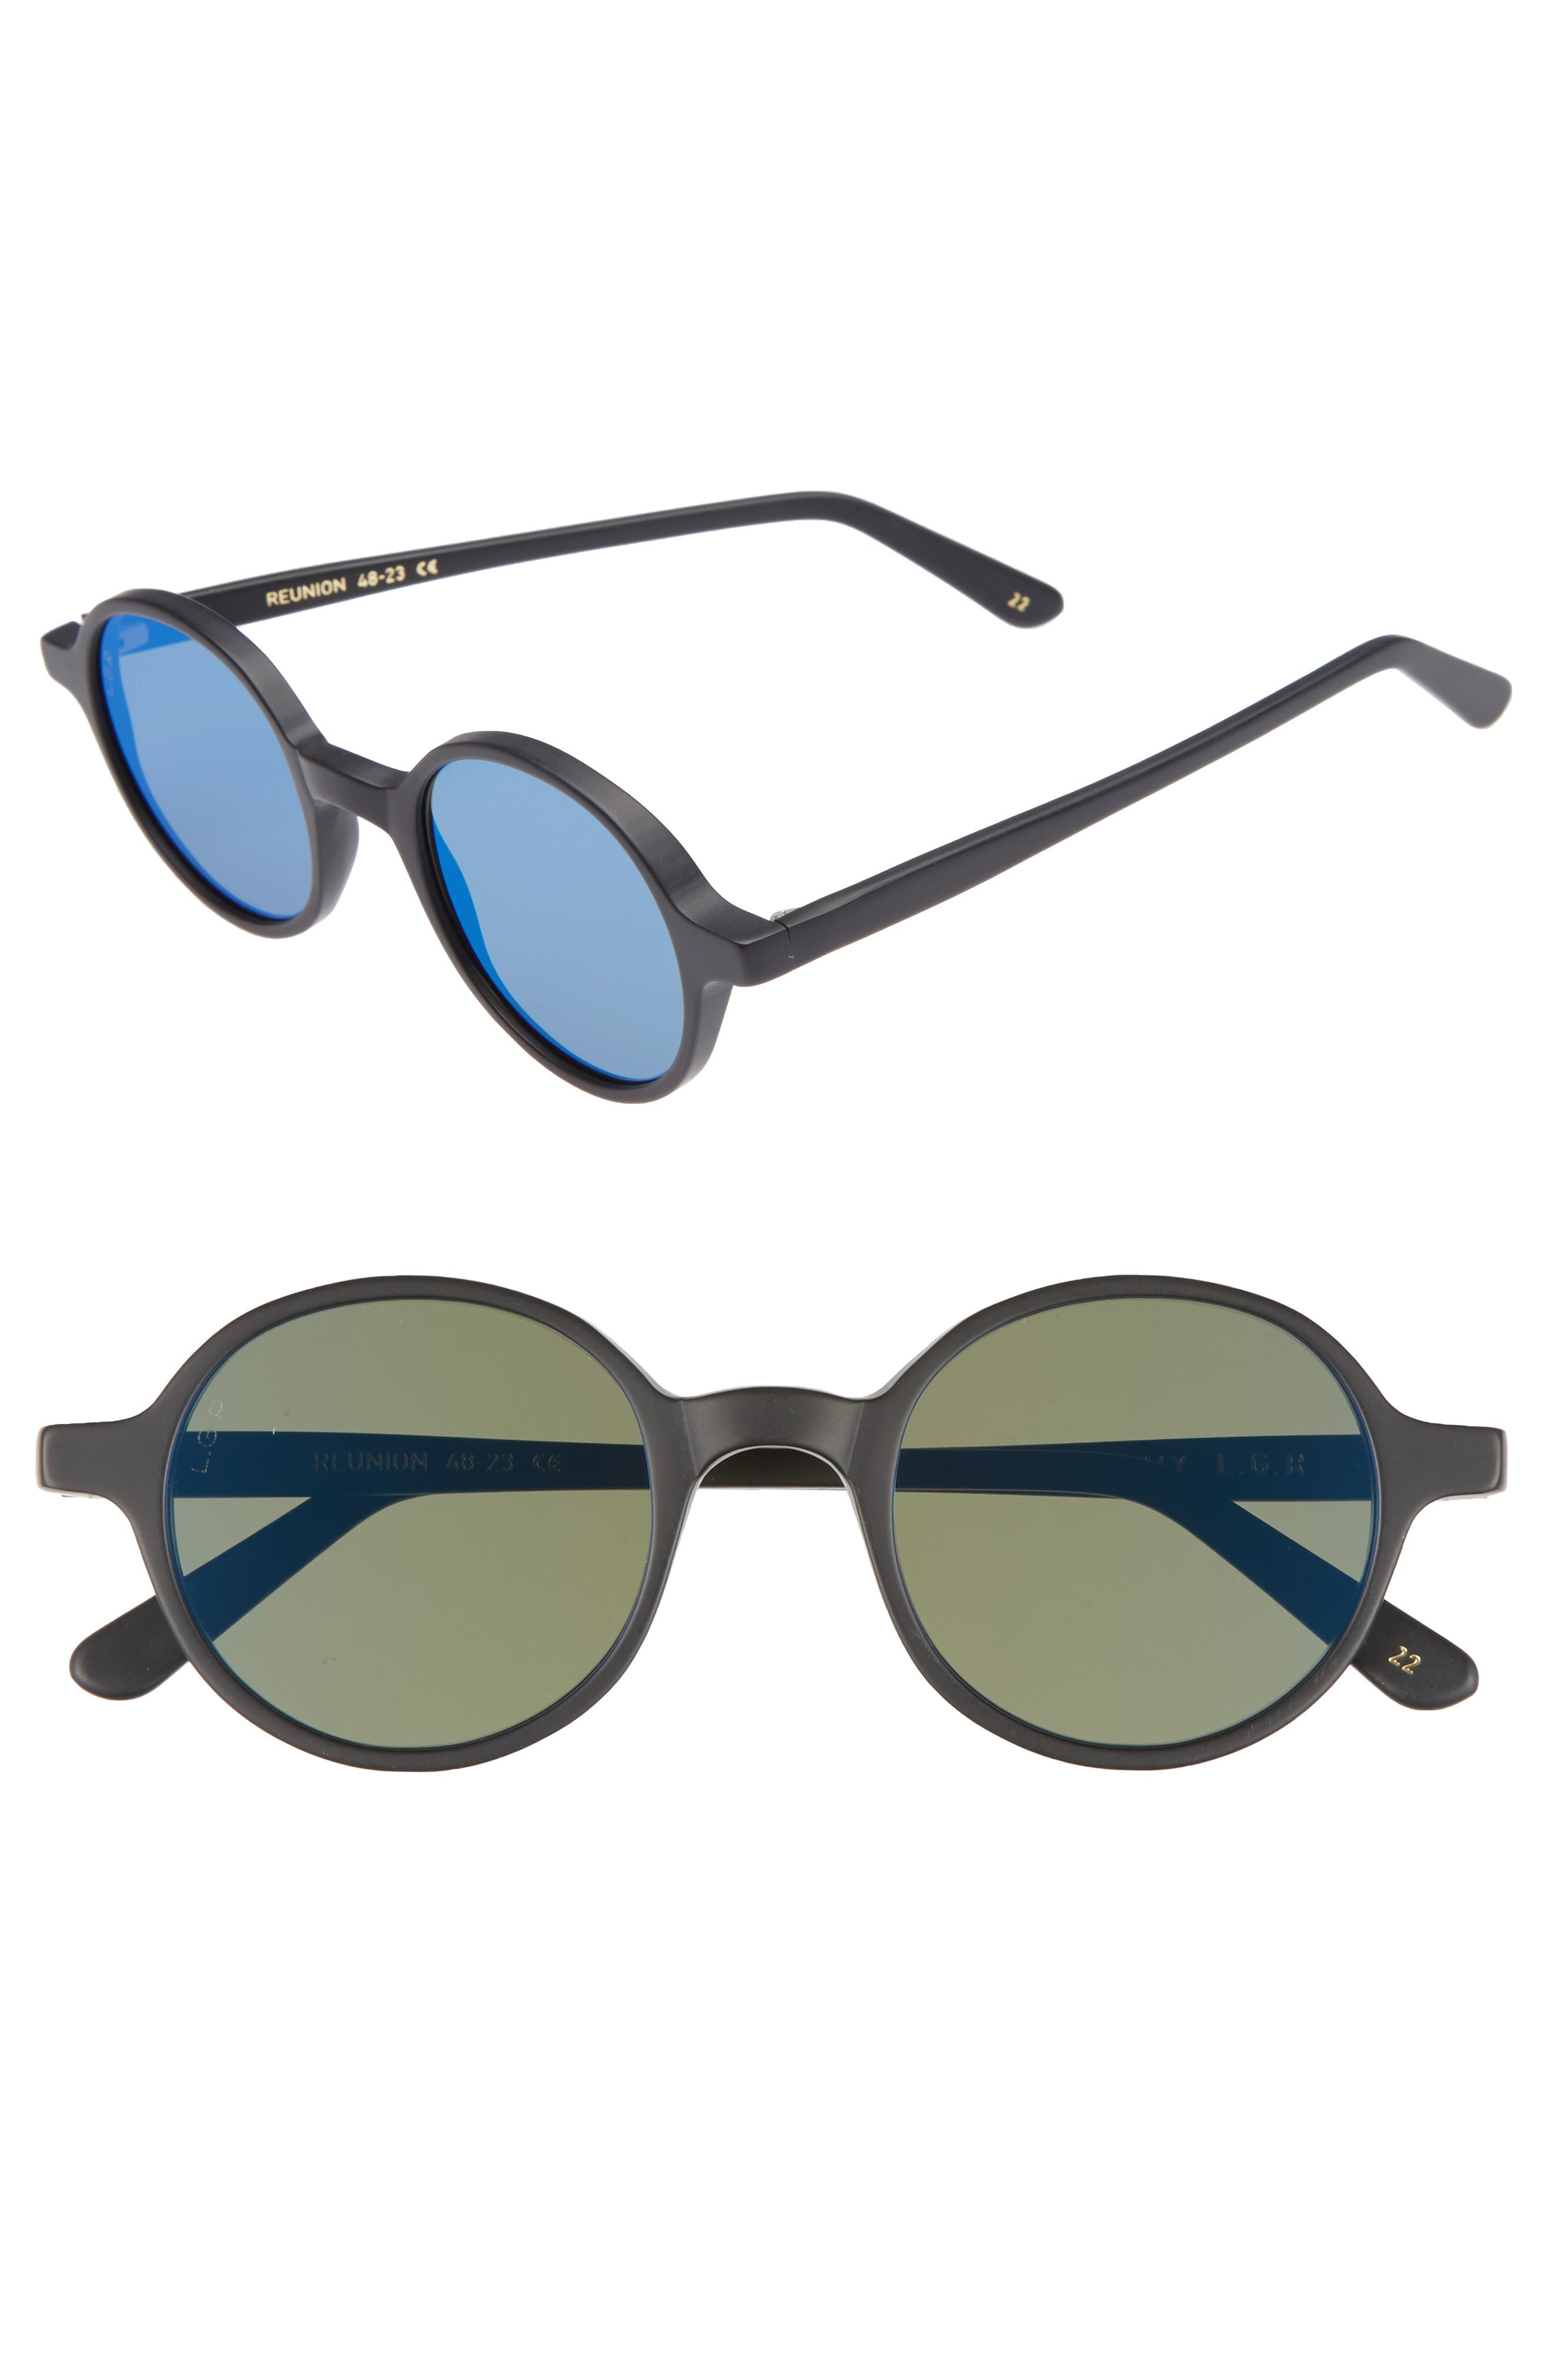 Reunion 48mm Sunglasses,                         Main,                         color,